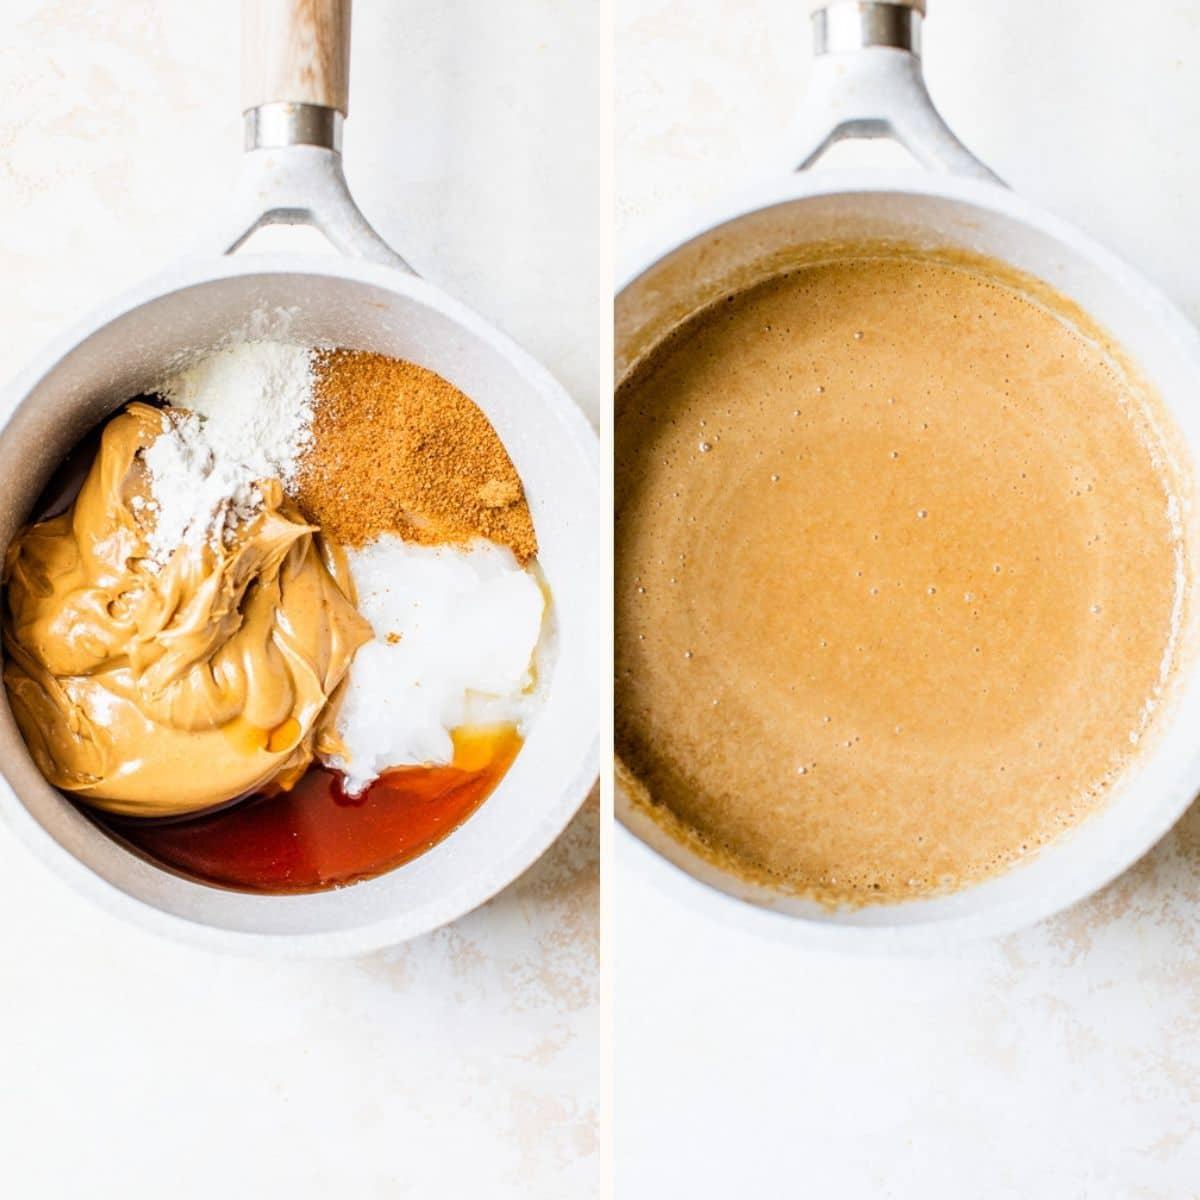 peanut butter in a saucepan